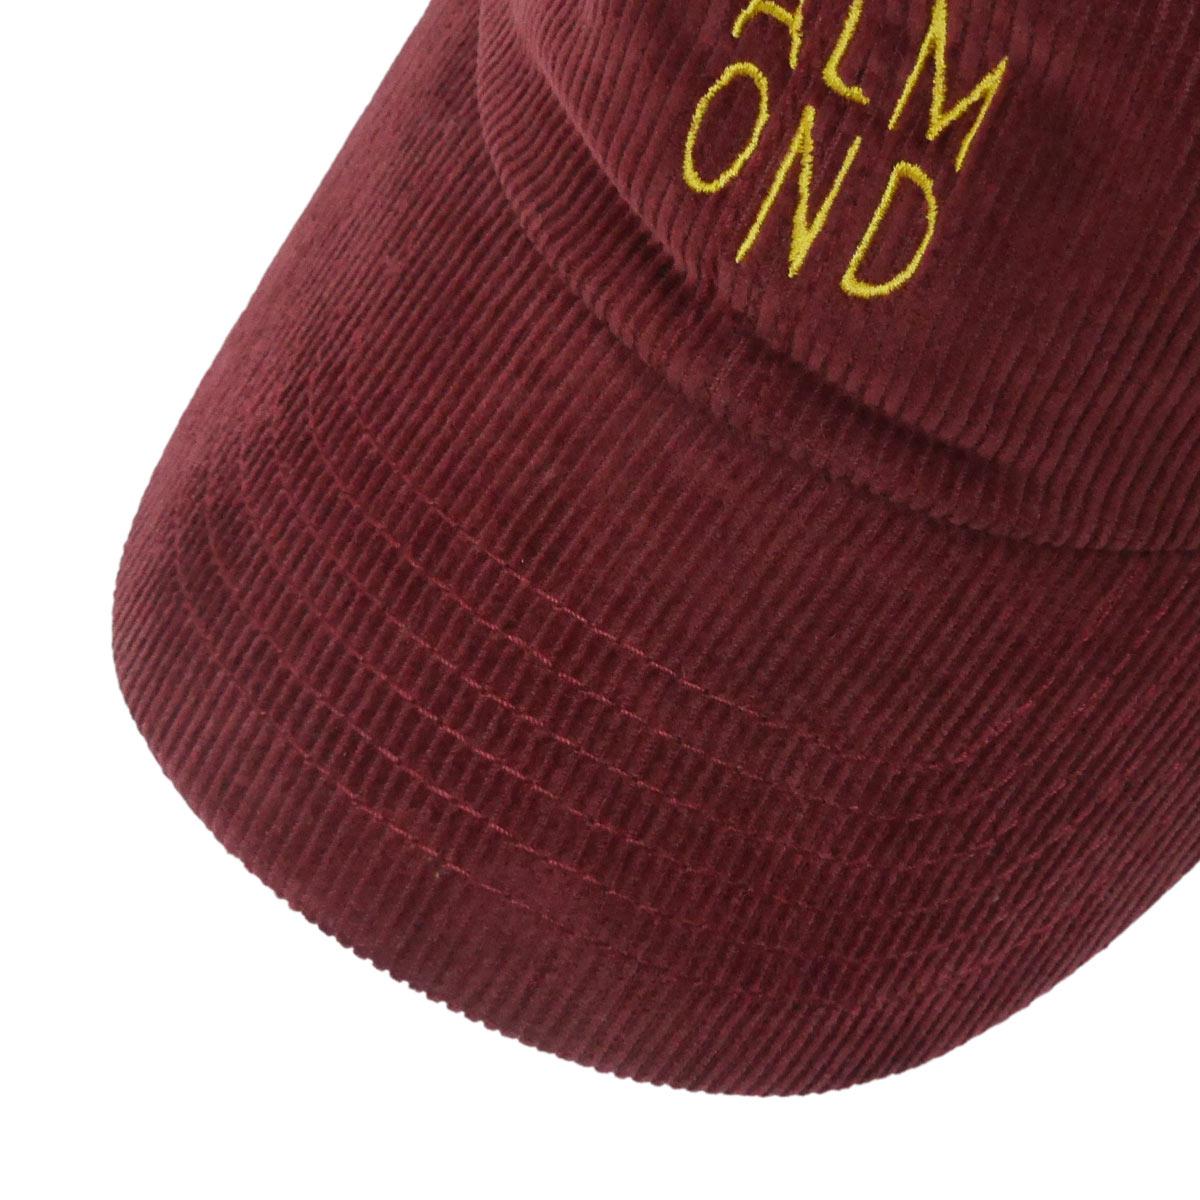 Almond Surf アーモンドサーフボードデザイン ALMOND CORDUROY CAP